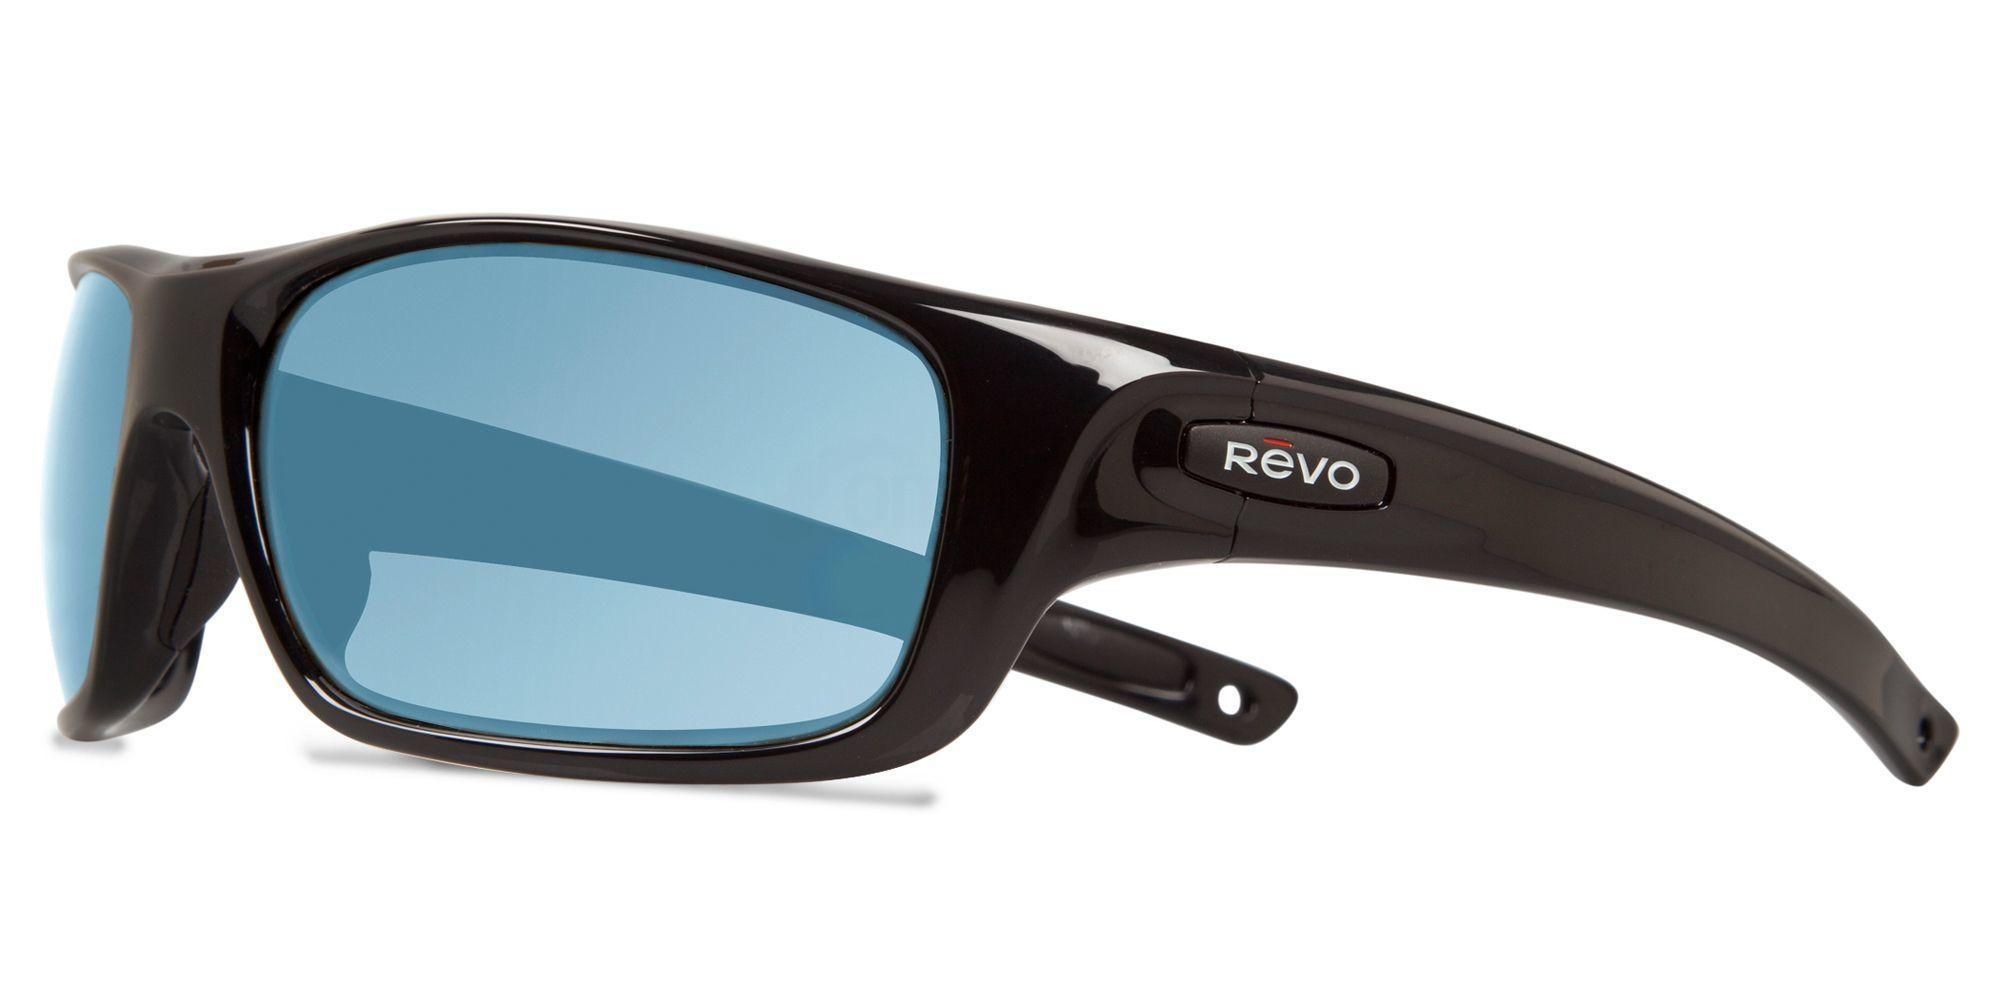 01BL Guide II - RE4073 , Revo